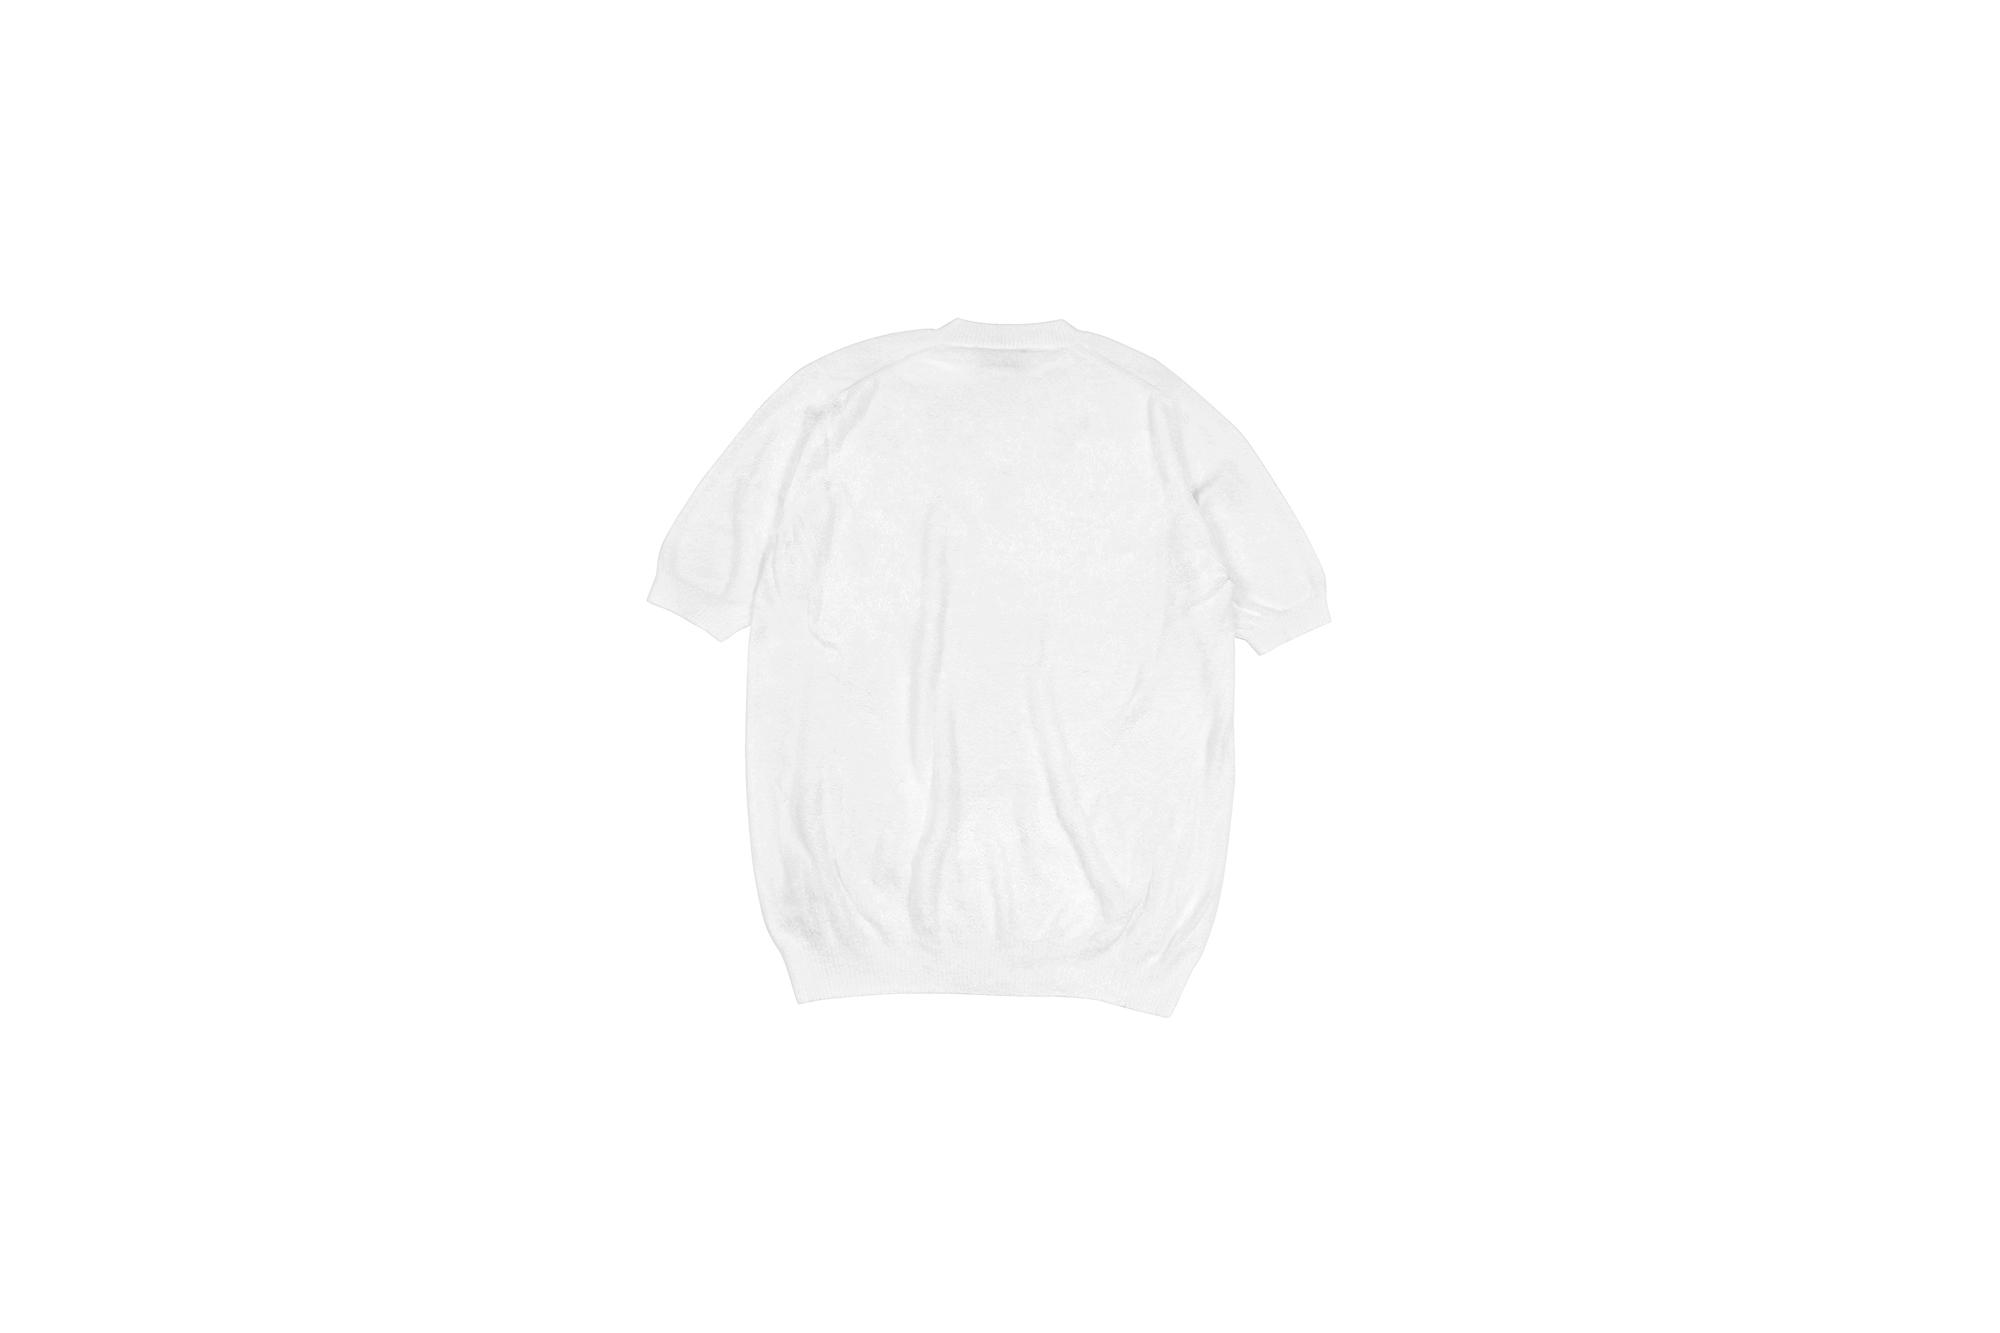 Settefili Cashmere (セッテフィーリ カシミア) Pile Knit T-shirt パイルニットTシャツ WHITE (ホワイト・GD01) made in italy (イタリア製) 2020 春夏新作 愛知 名古屋 altoediritto アルトエデリット